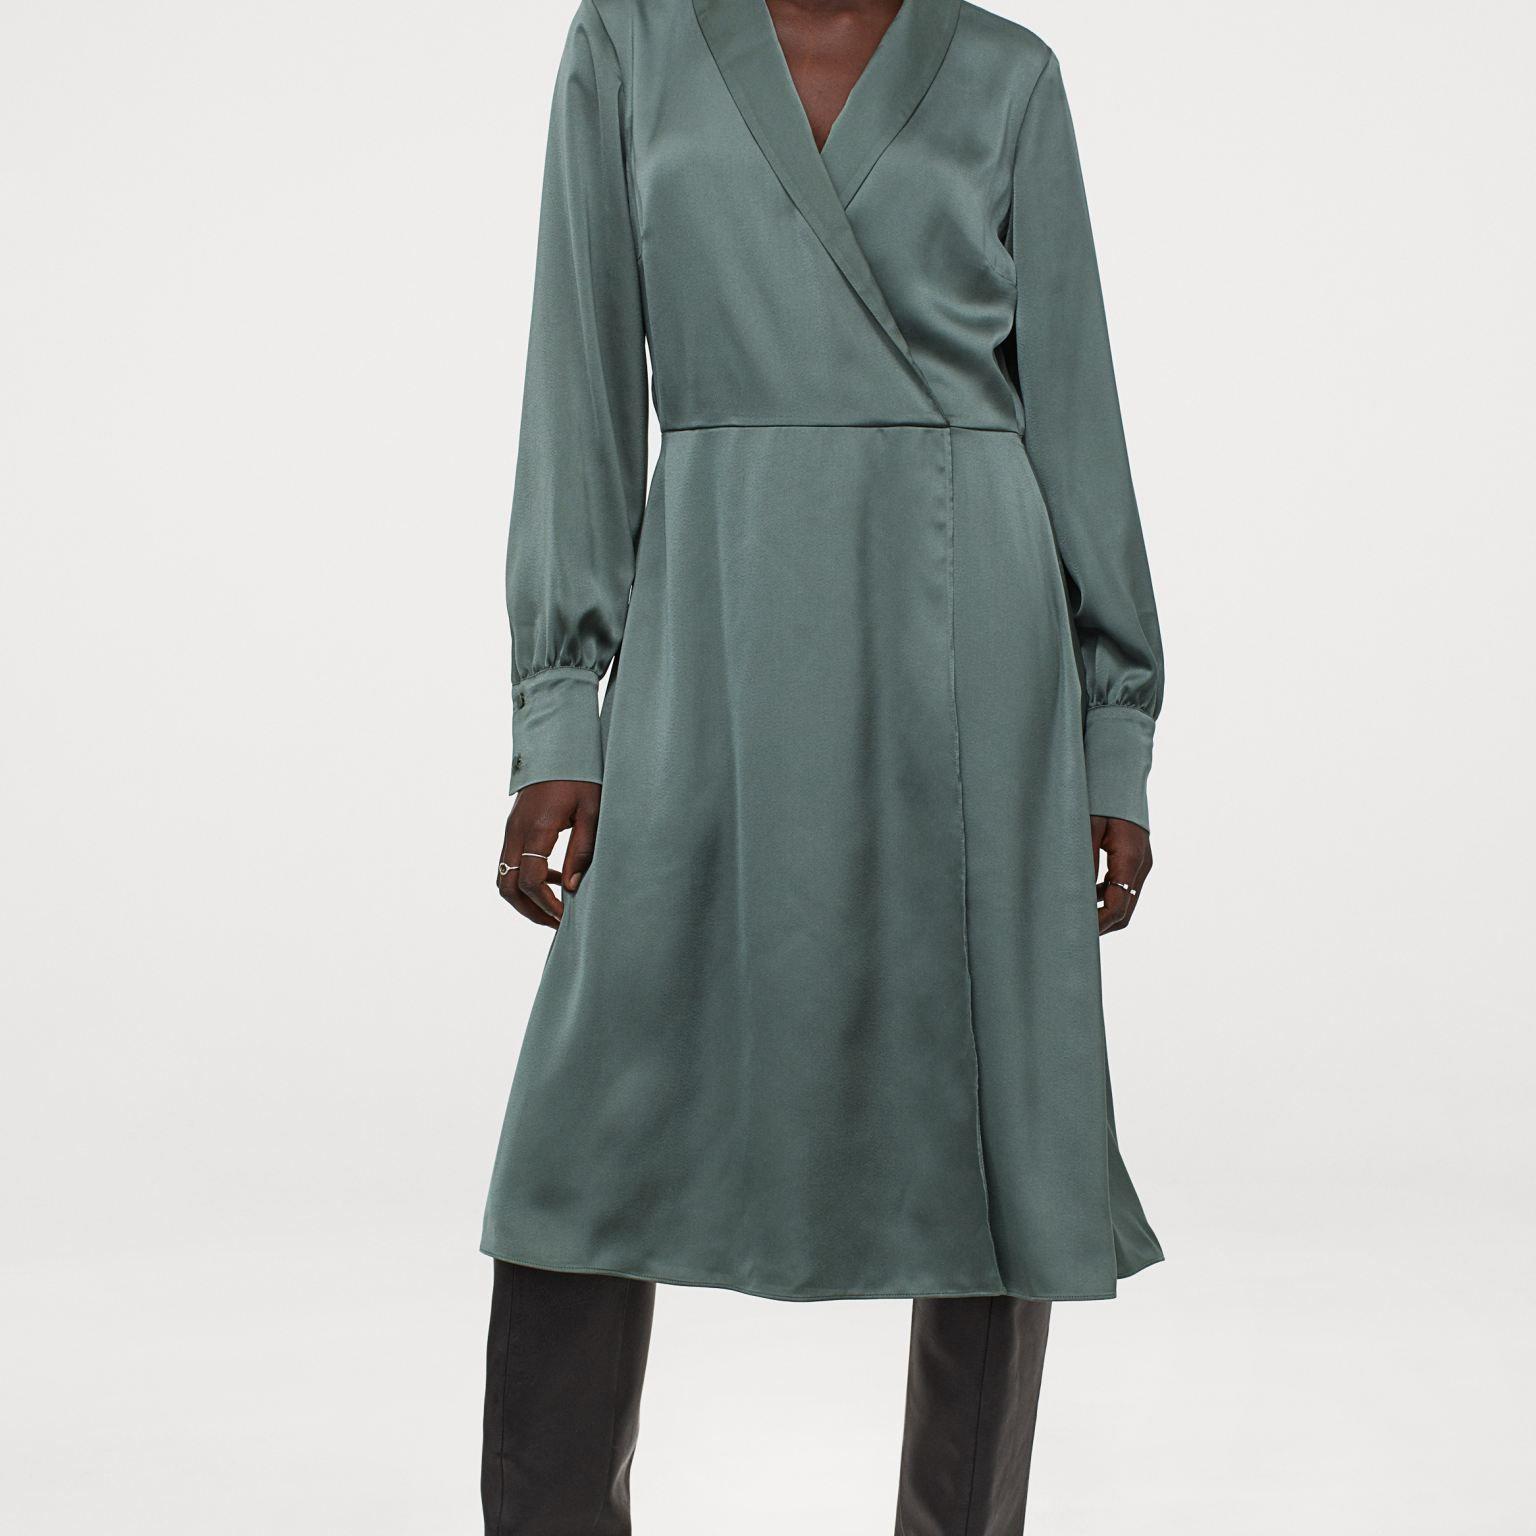 H&M Shawl-Collar Wrap Dress